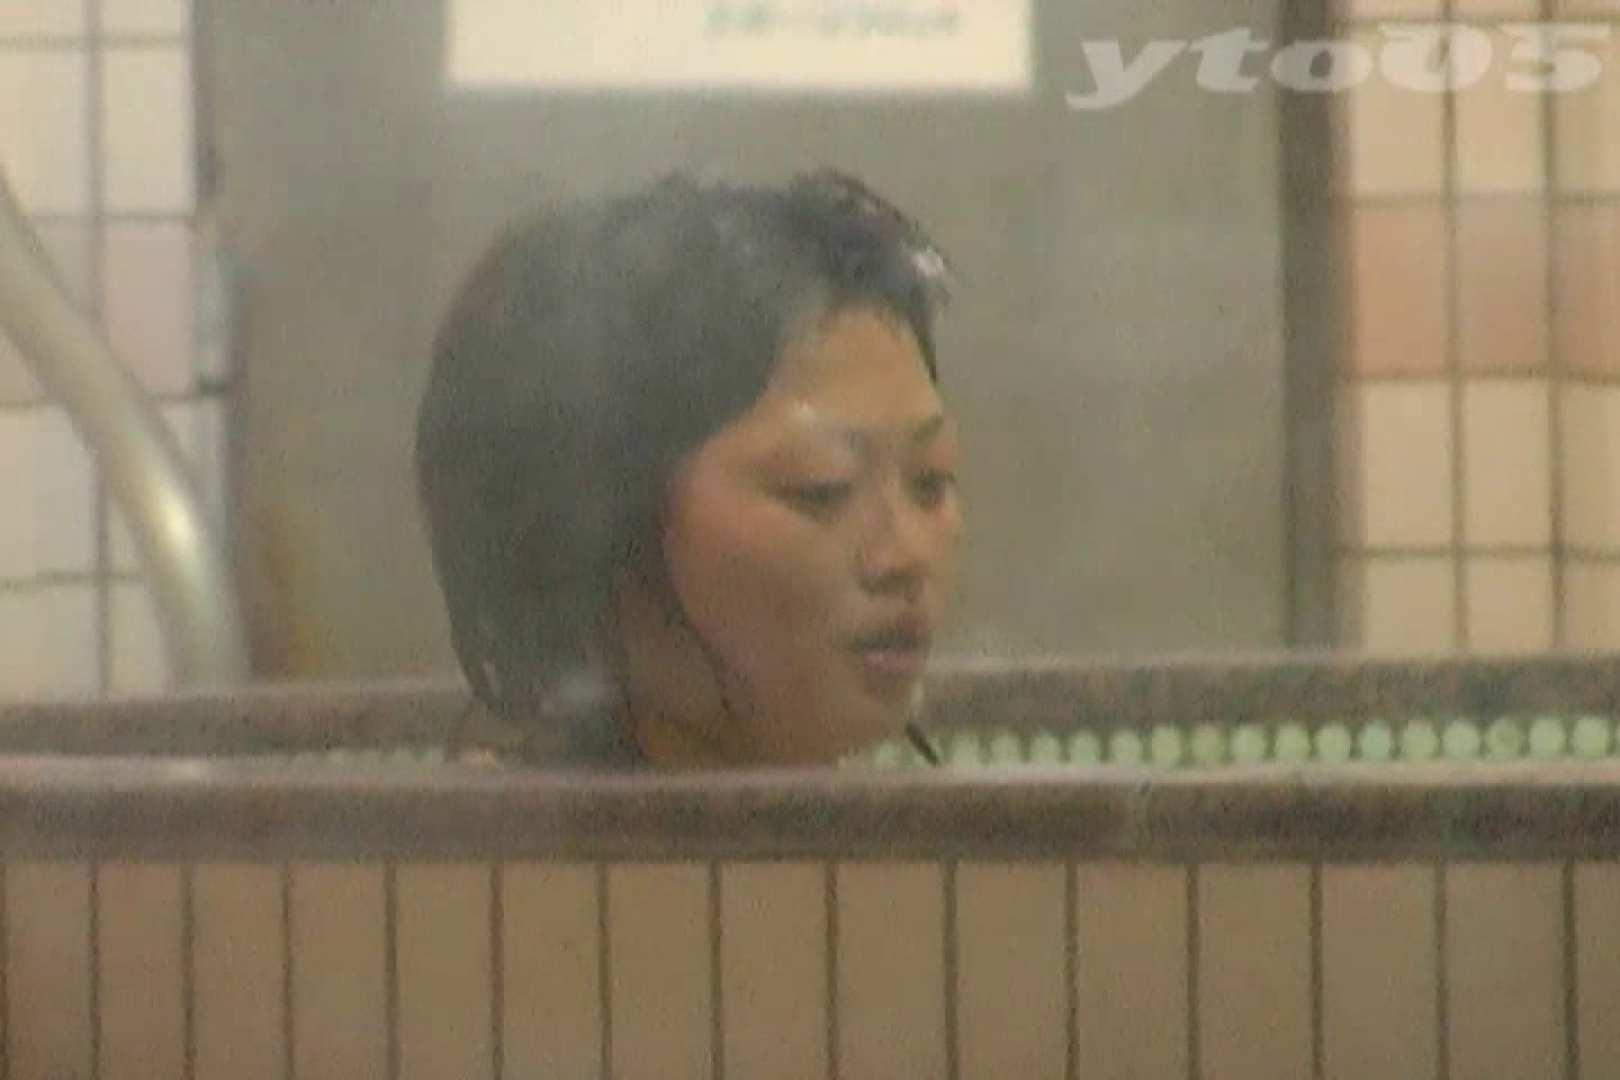 ▲復活限定▲合宿ホテル女風呂盗撮 Vol.28 OL | 合宿  38連発